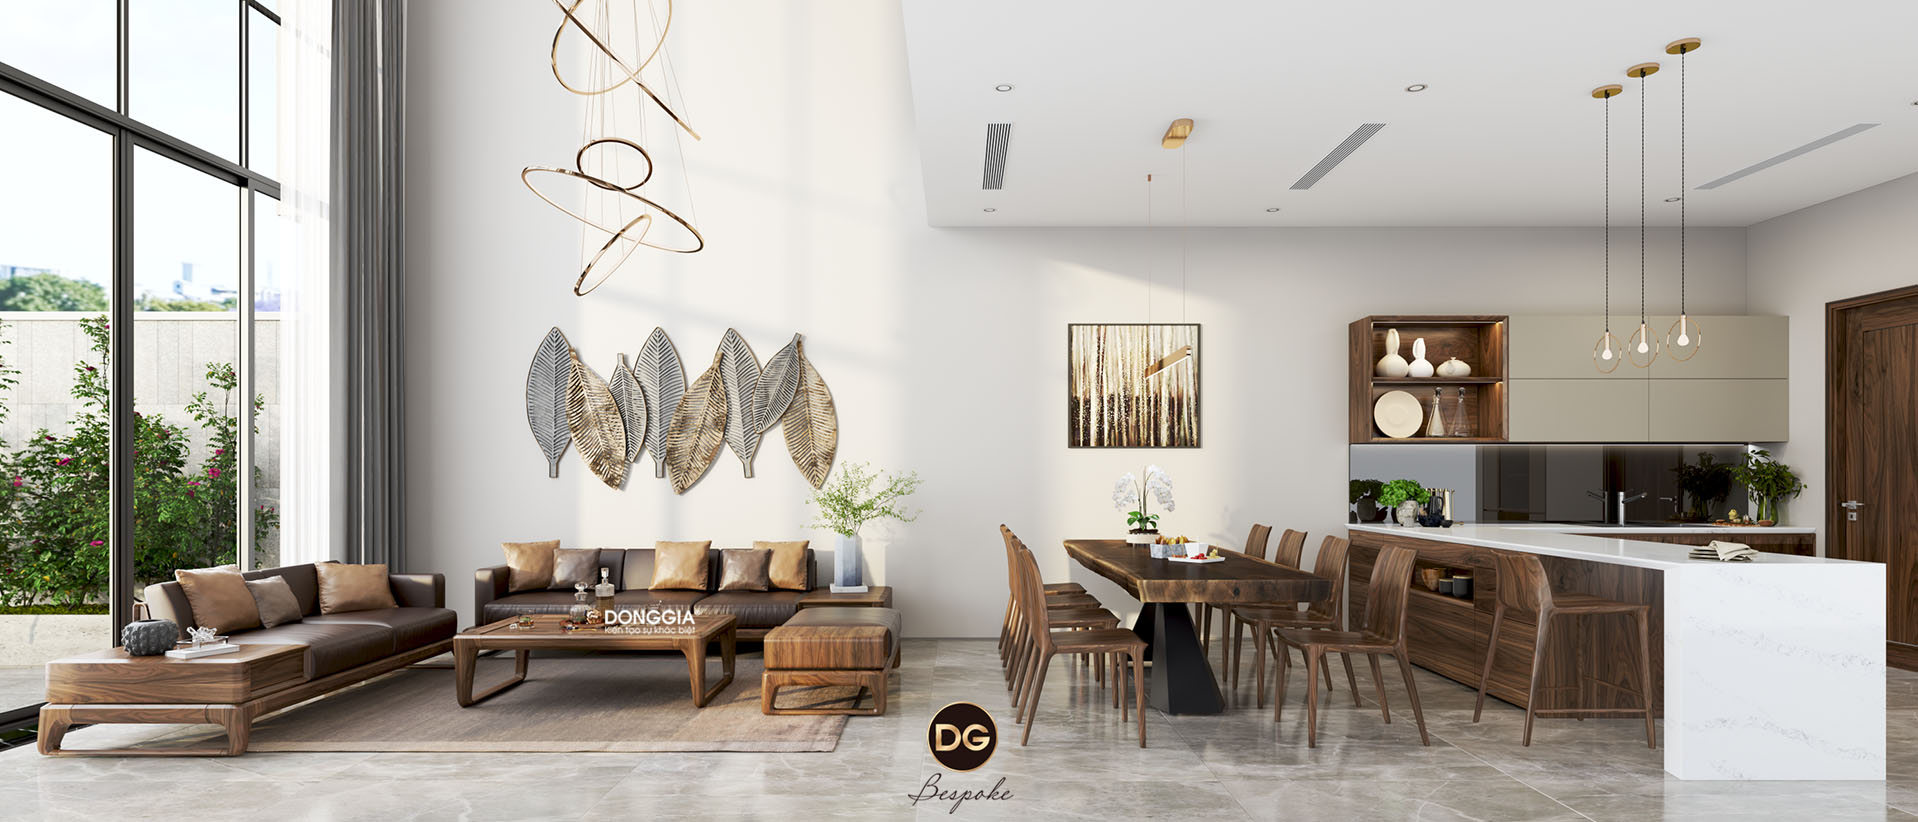 go-oc-cho-dg-ban-giao-huong-mang-ten-doc-ban (7)